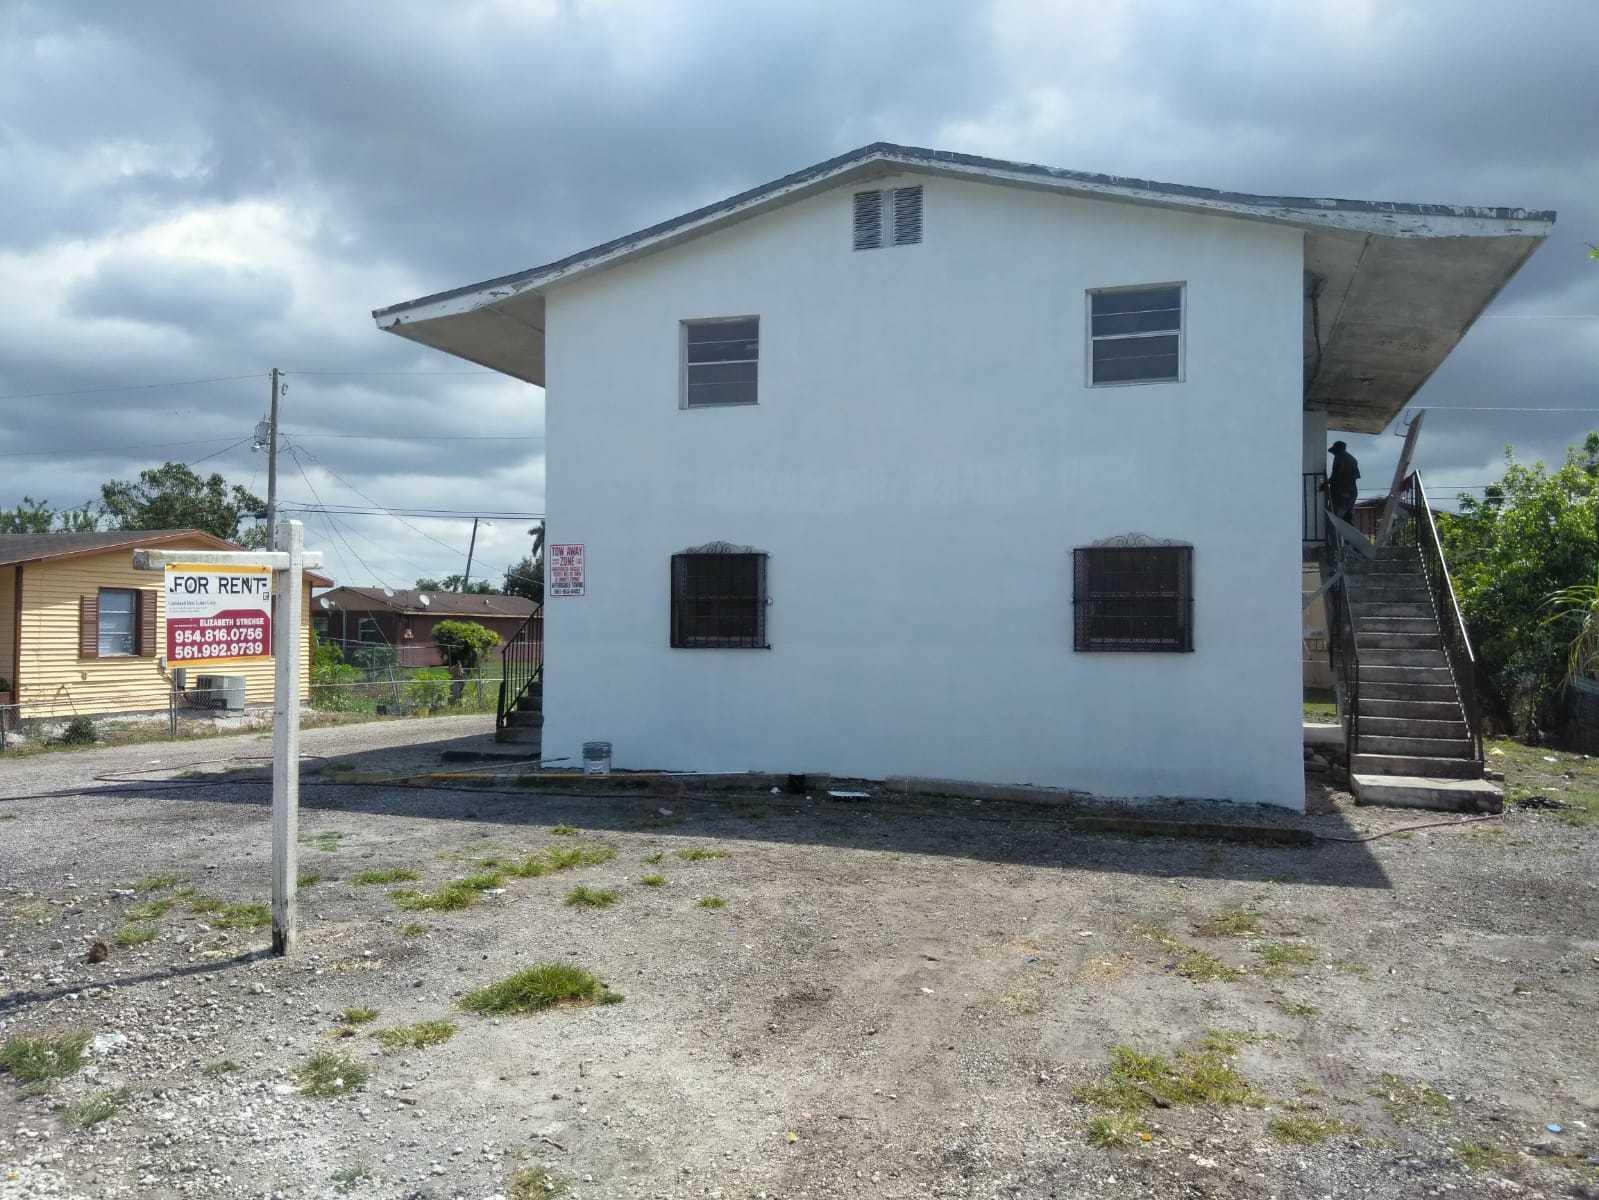 545 4th Street, Belle Glade, Florida 33430, 10 Bedrooms Bedrooms, ,4 BathroomsBathrooms,Duplex/Triplex/Quadplex,For Rent,4th,1,RX-10514308